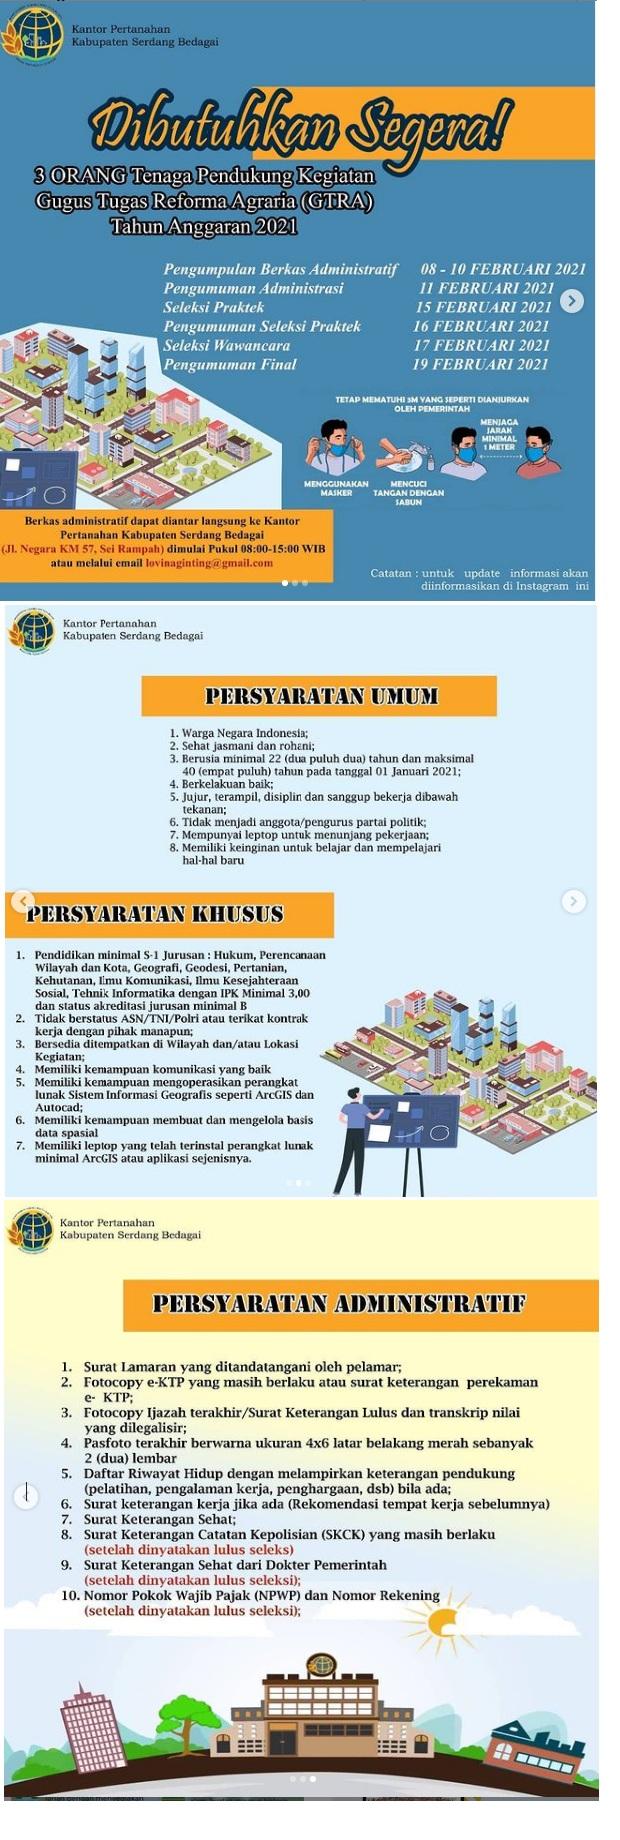 Kantor Pertanahan BPN Bulan Februari 2021